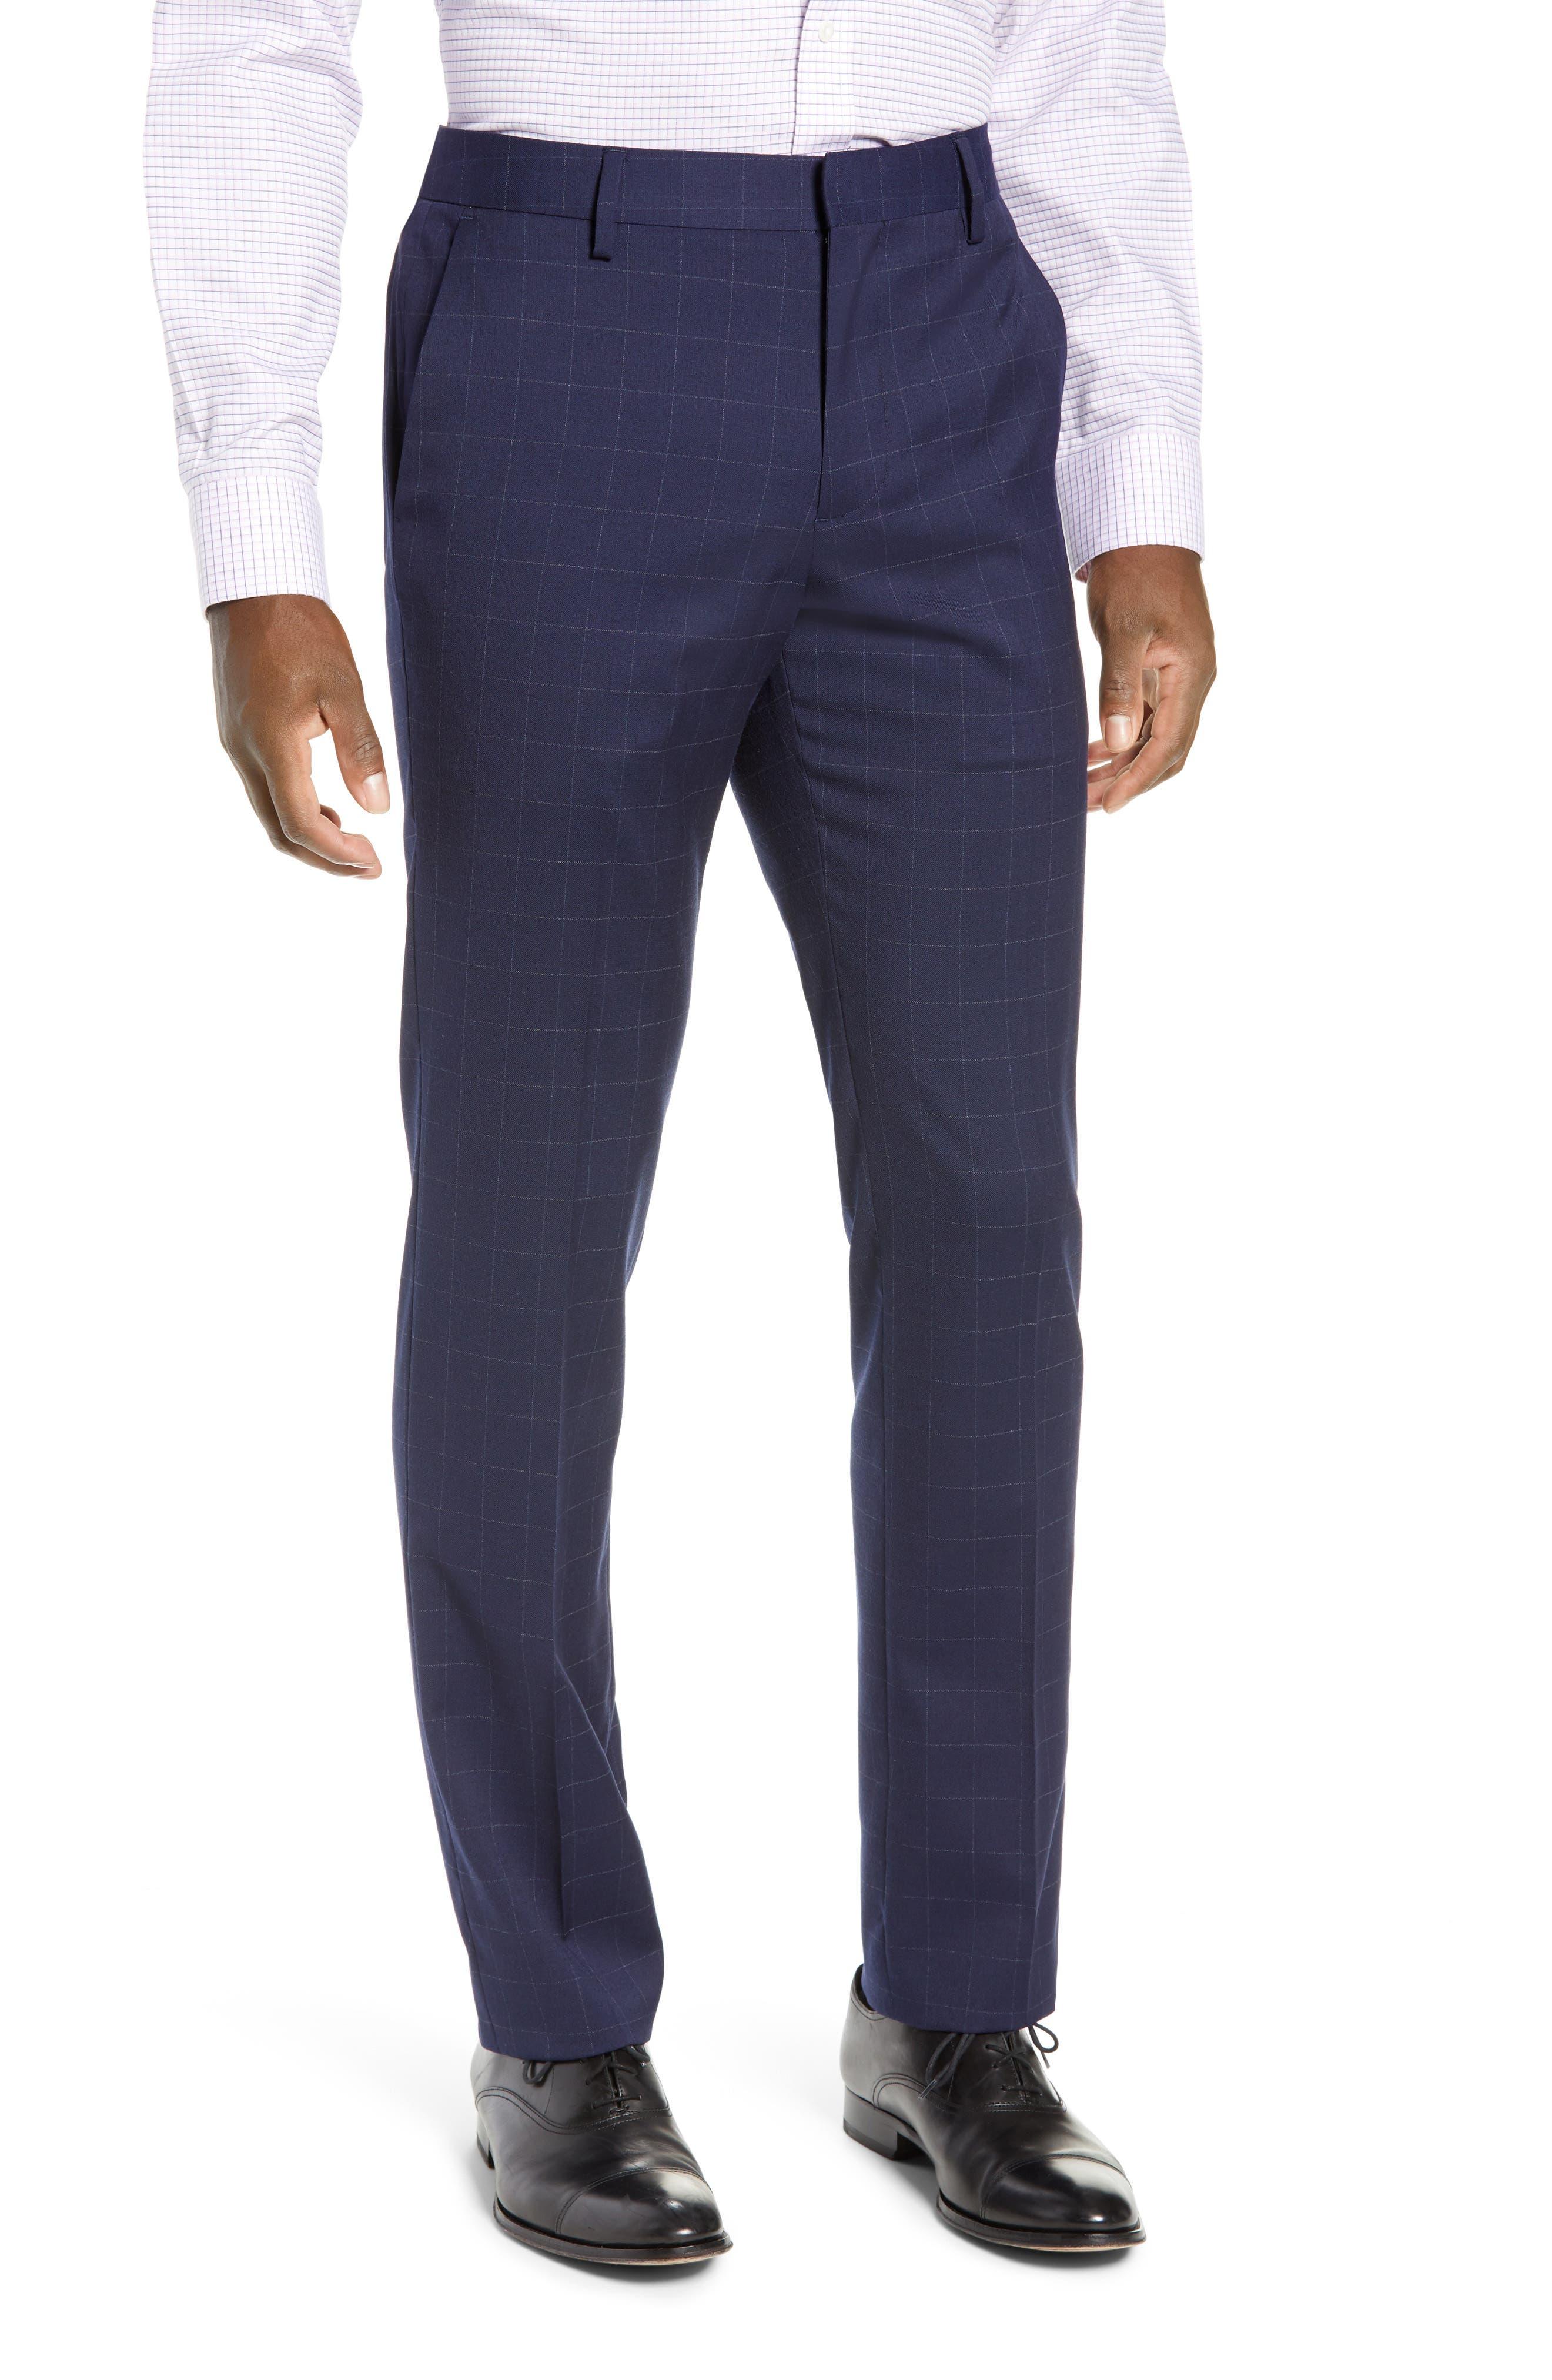 Jetsetter Slim Fit Stretch Suit Pants,                             Main thumbnail 1, color,                             NAVY CHALK WINDOWPANE